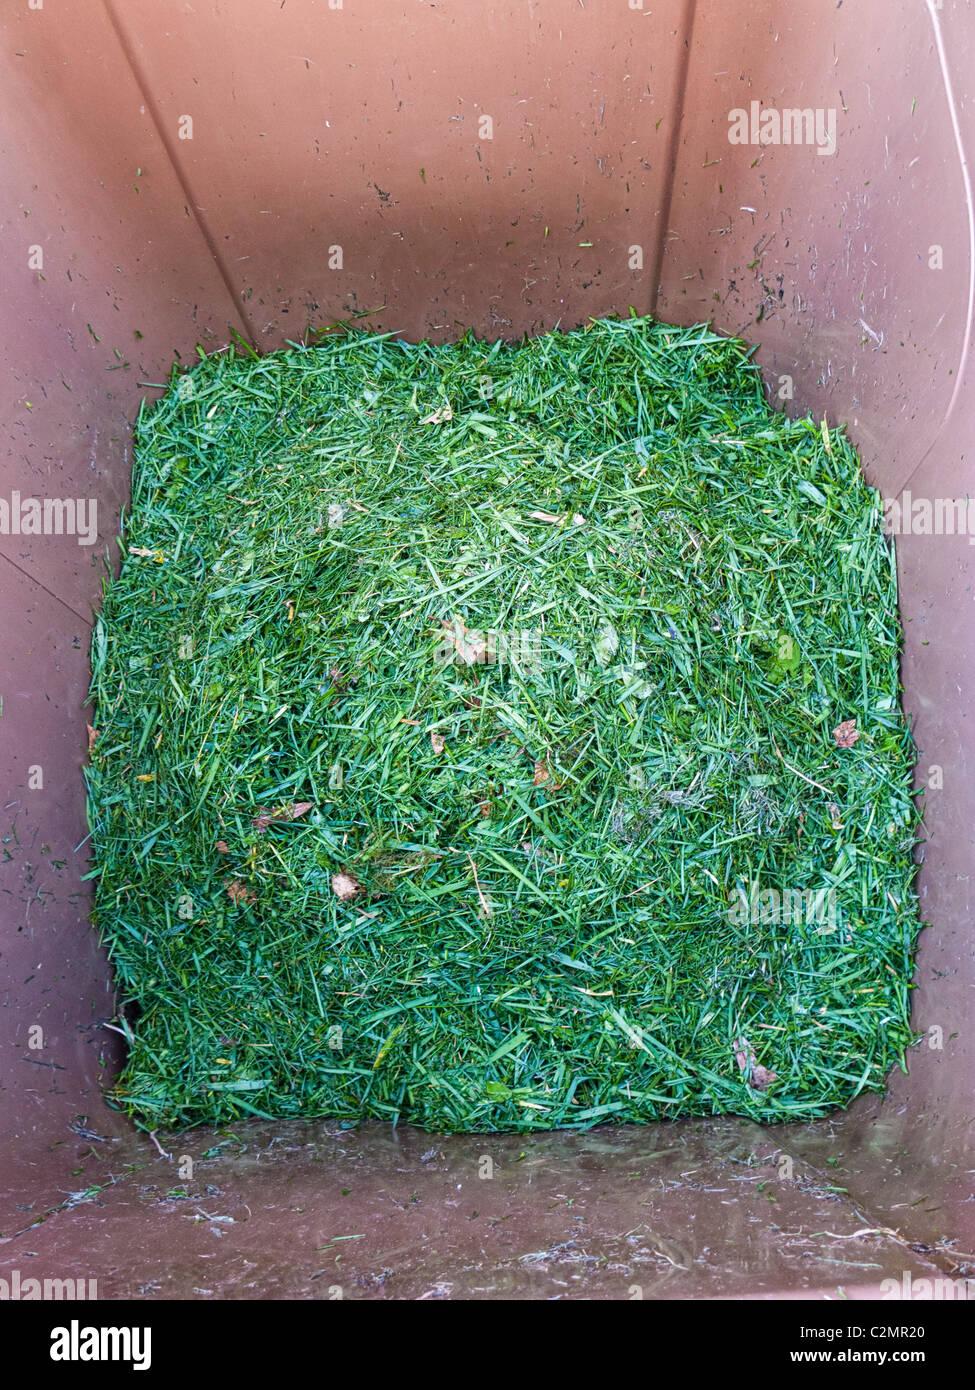 Grass cuttings inside a Garden Waste Wheelie Bin England UK - Stock Image